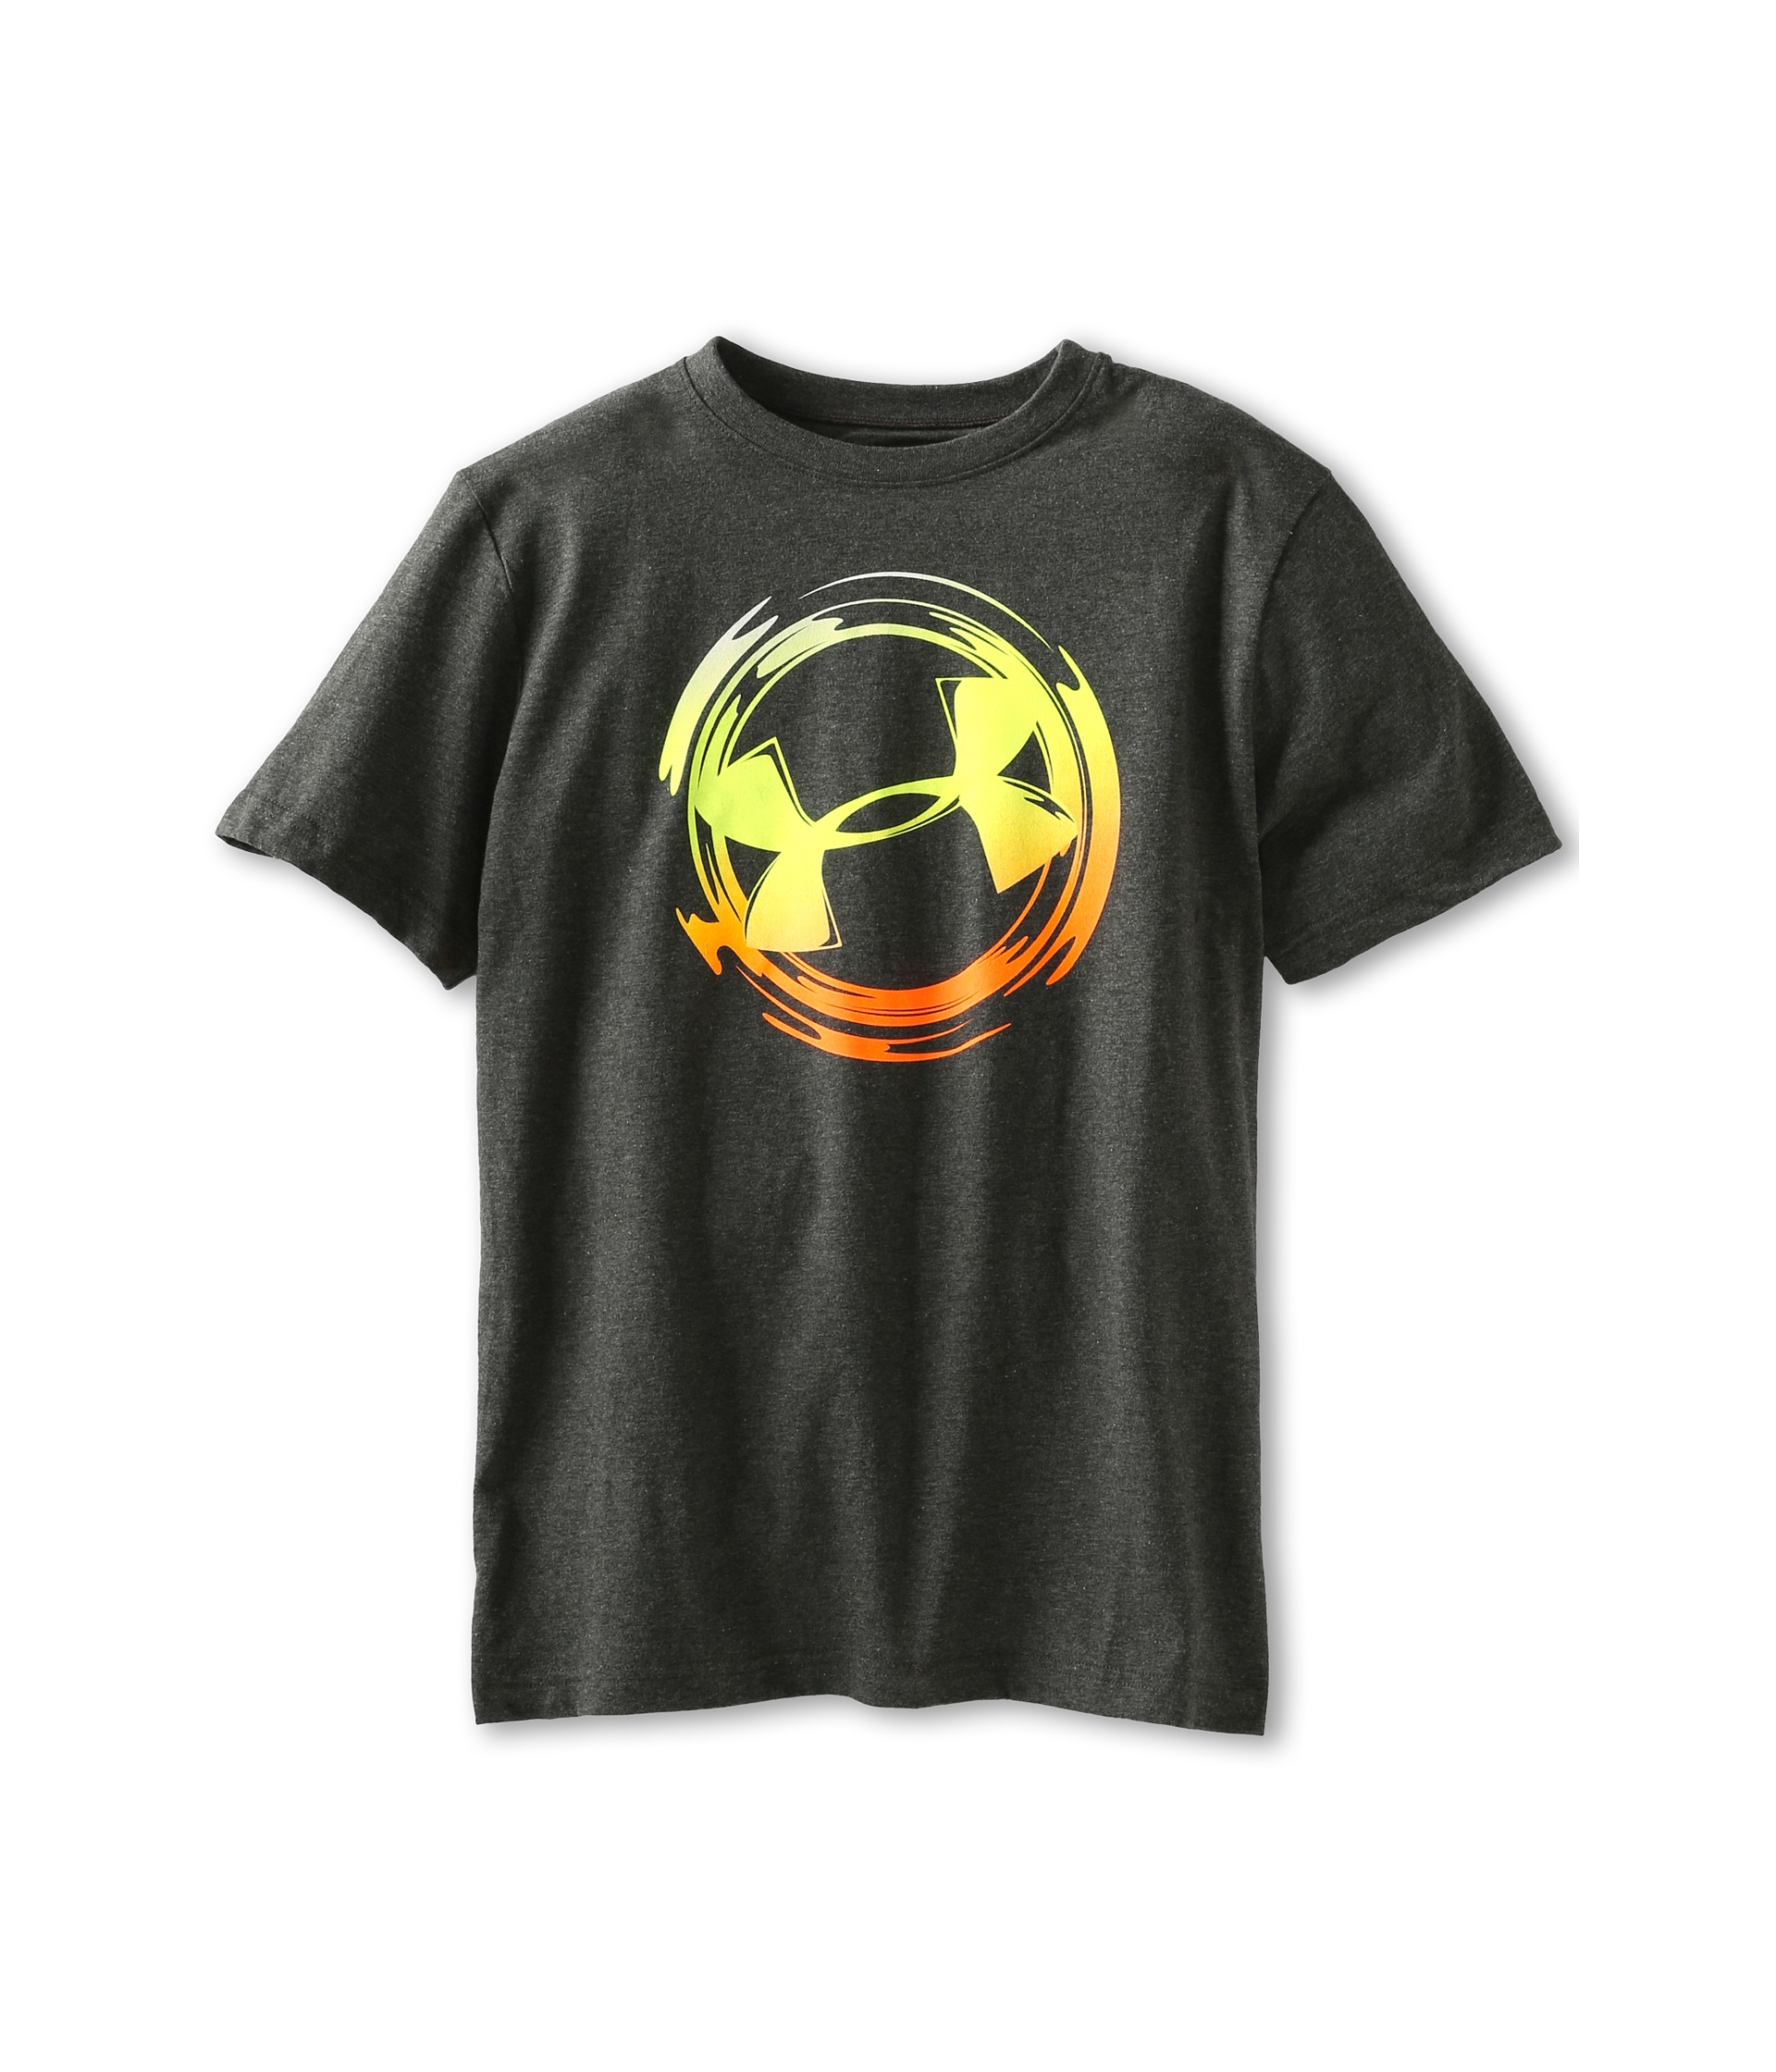 Under armour kids ua logo sphere t shirt big kids for Under armour shirts for kids